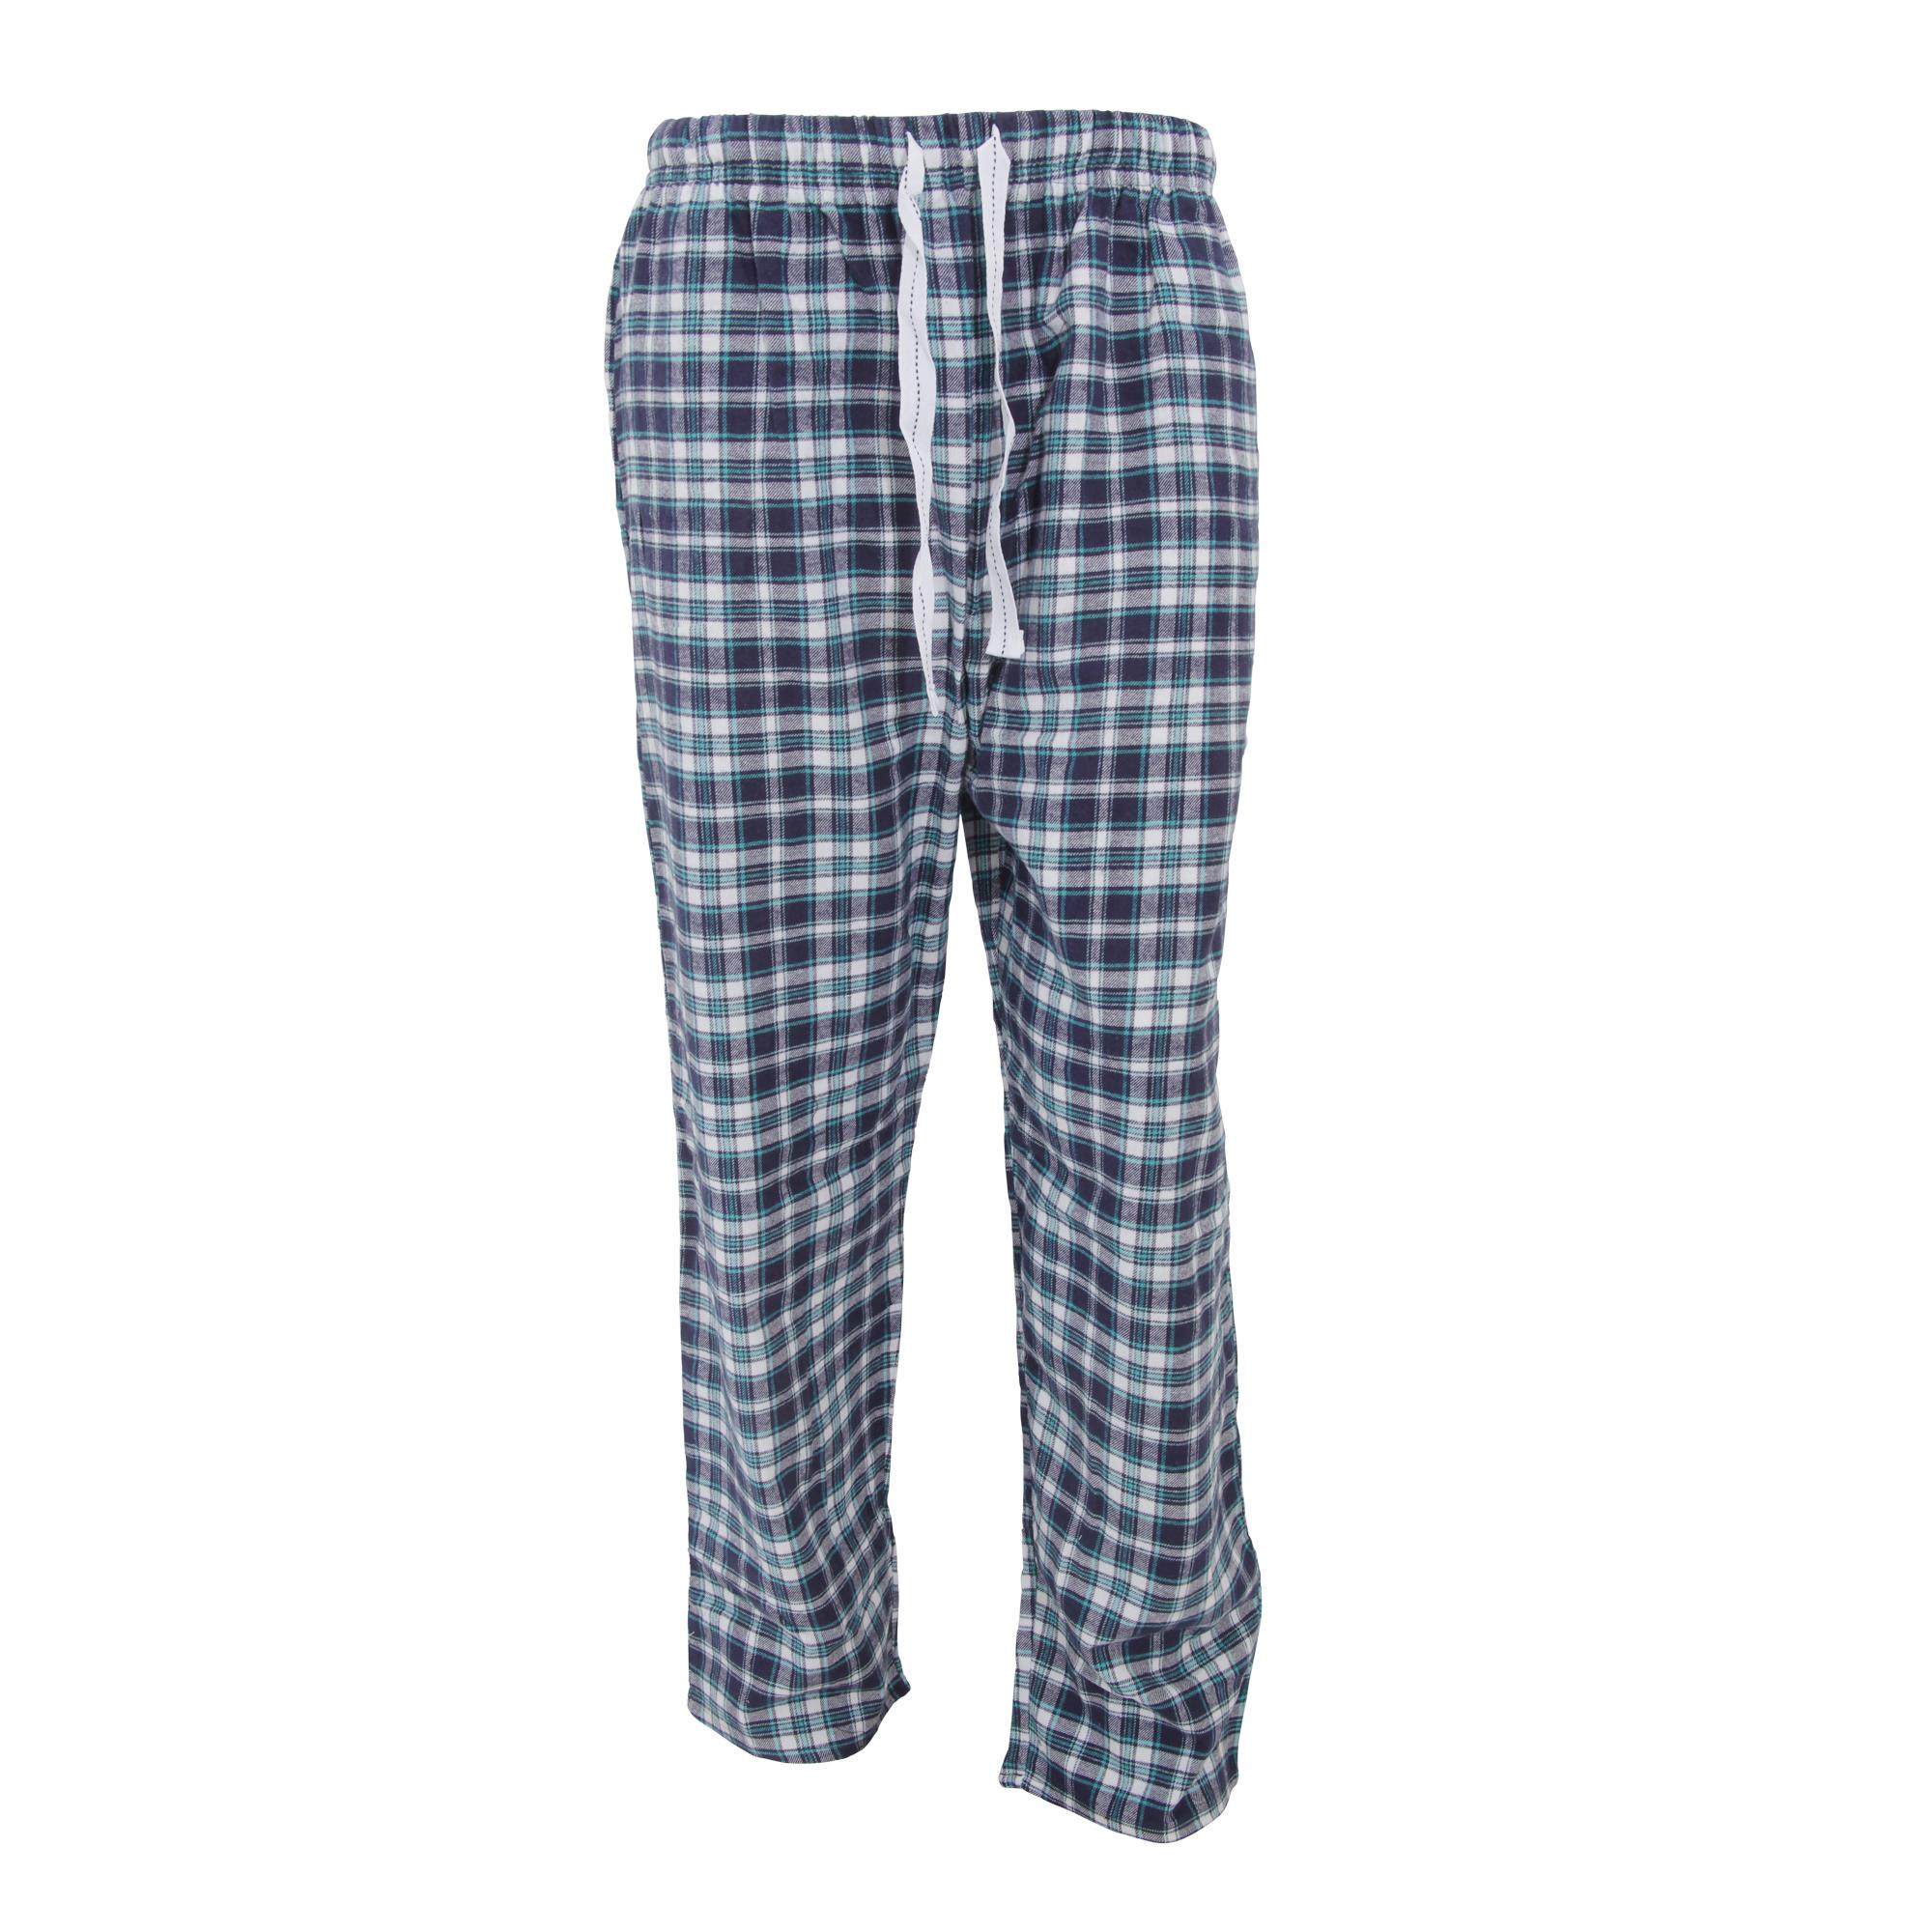 Shop men's sleepwear at Eddie Bauer. % Satisfaction guaranteed. Since